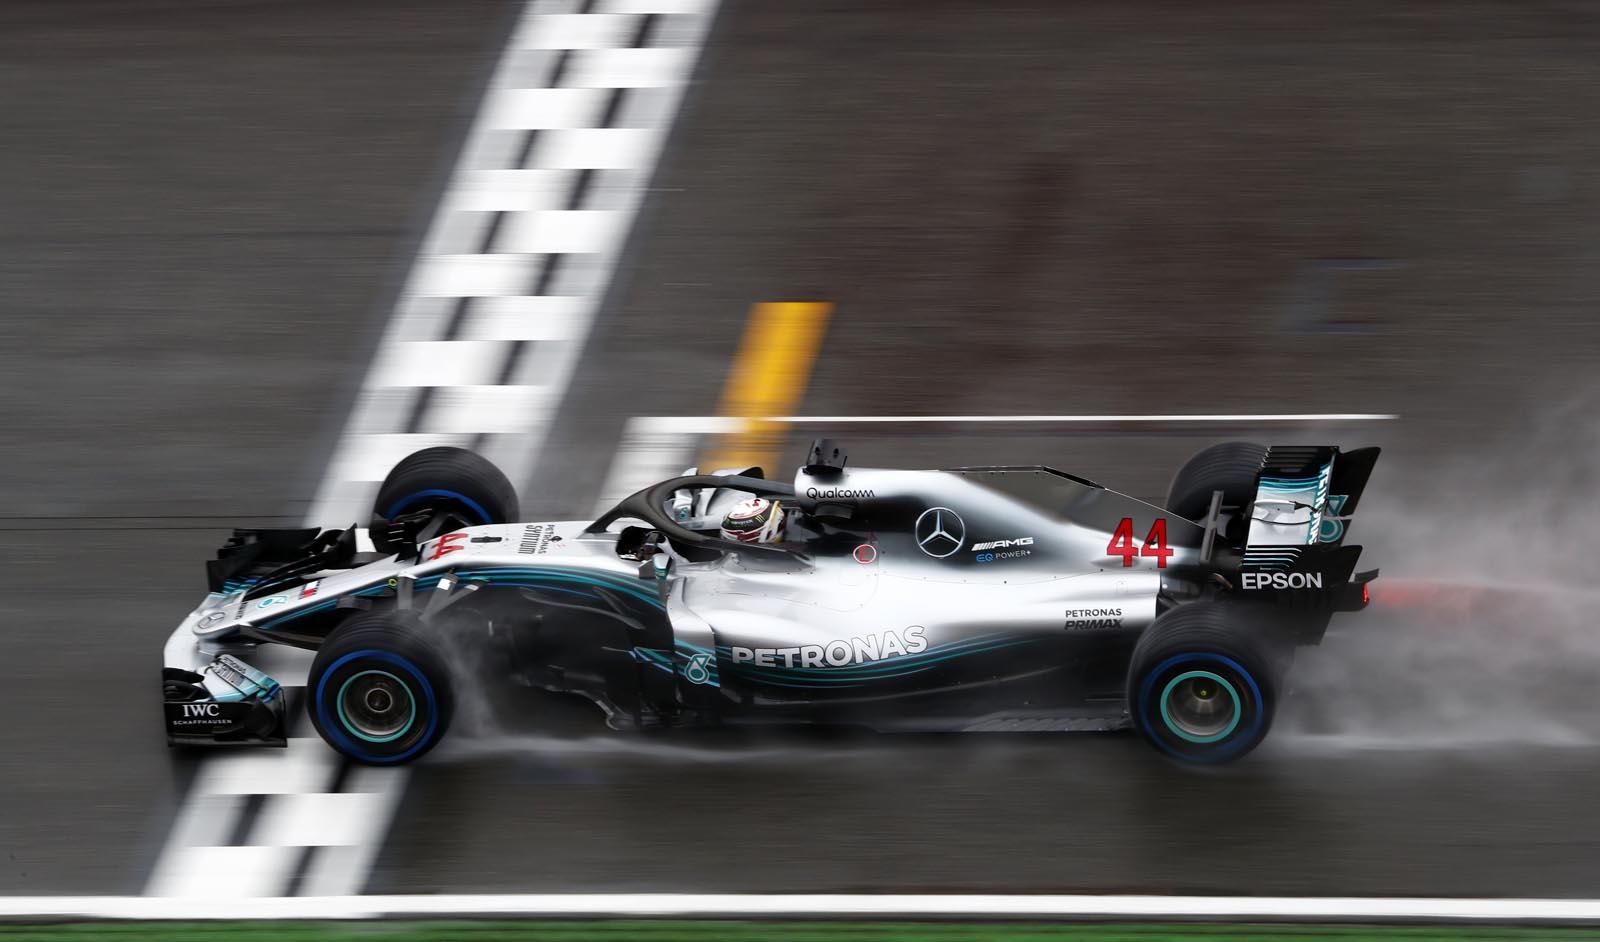 Photo of GP Γερμανίας: Αναπάντεχη νίκη για τον Hamilton, καταστροφή για τον Vettel